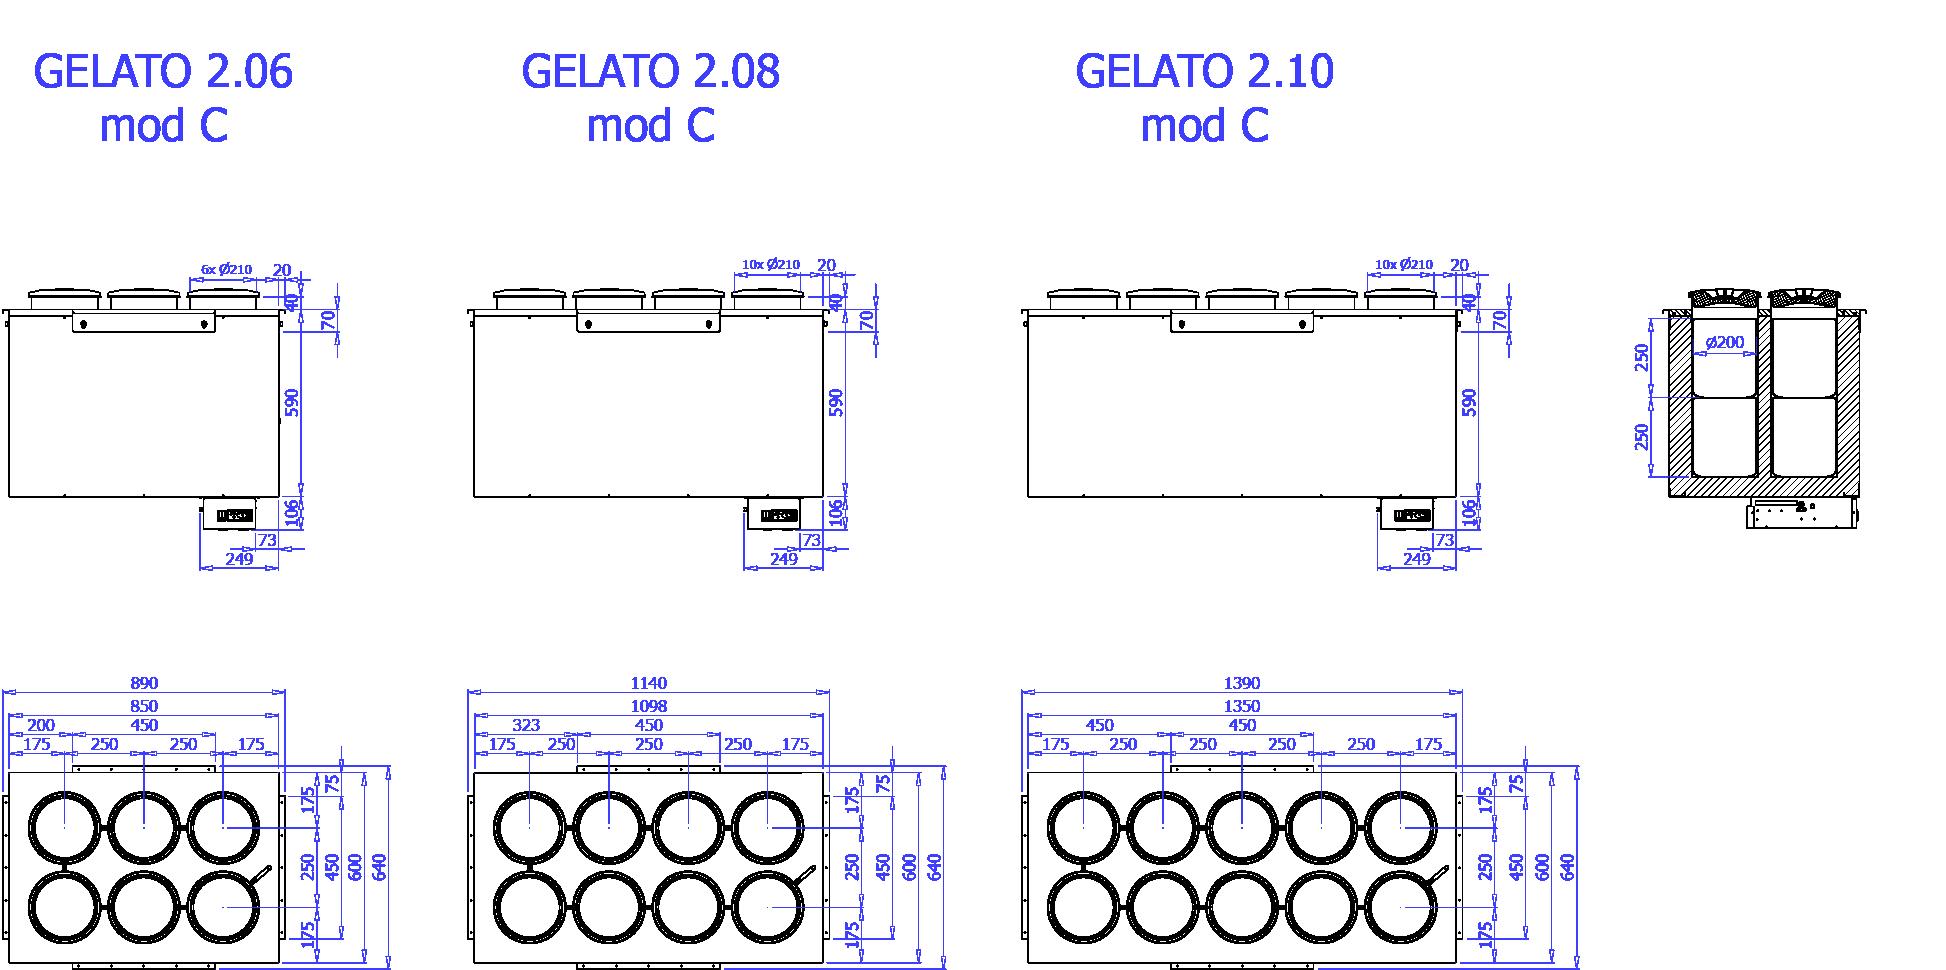 Technical drawing GELATO 2 MOD C